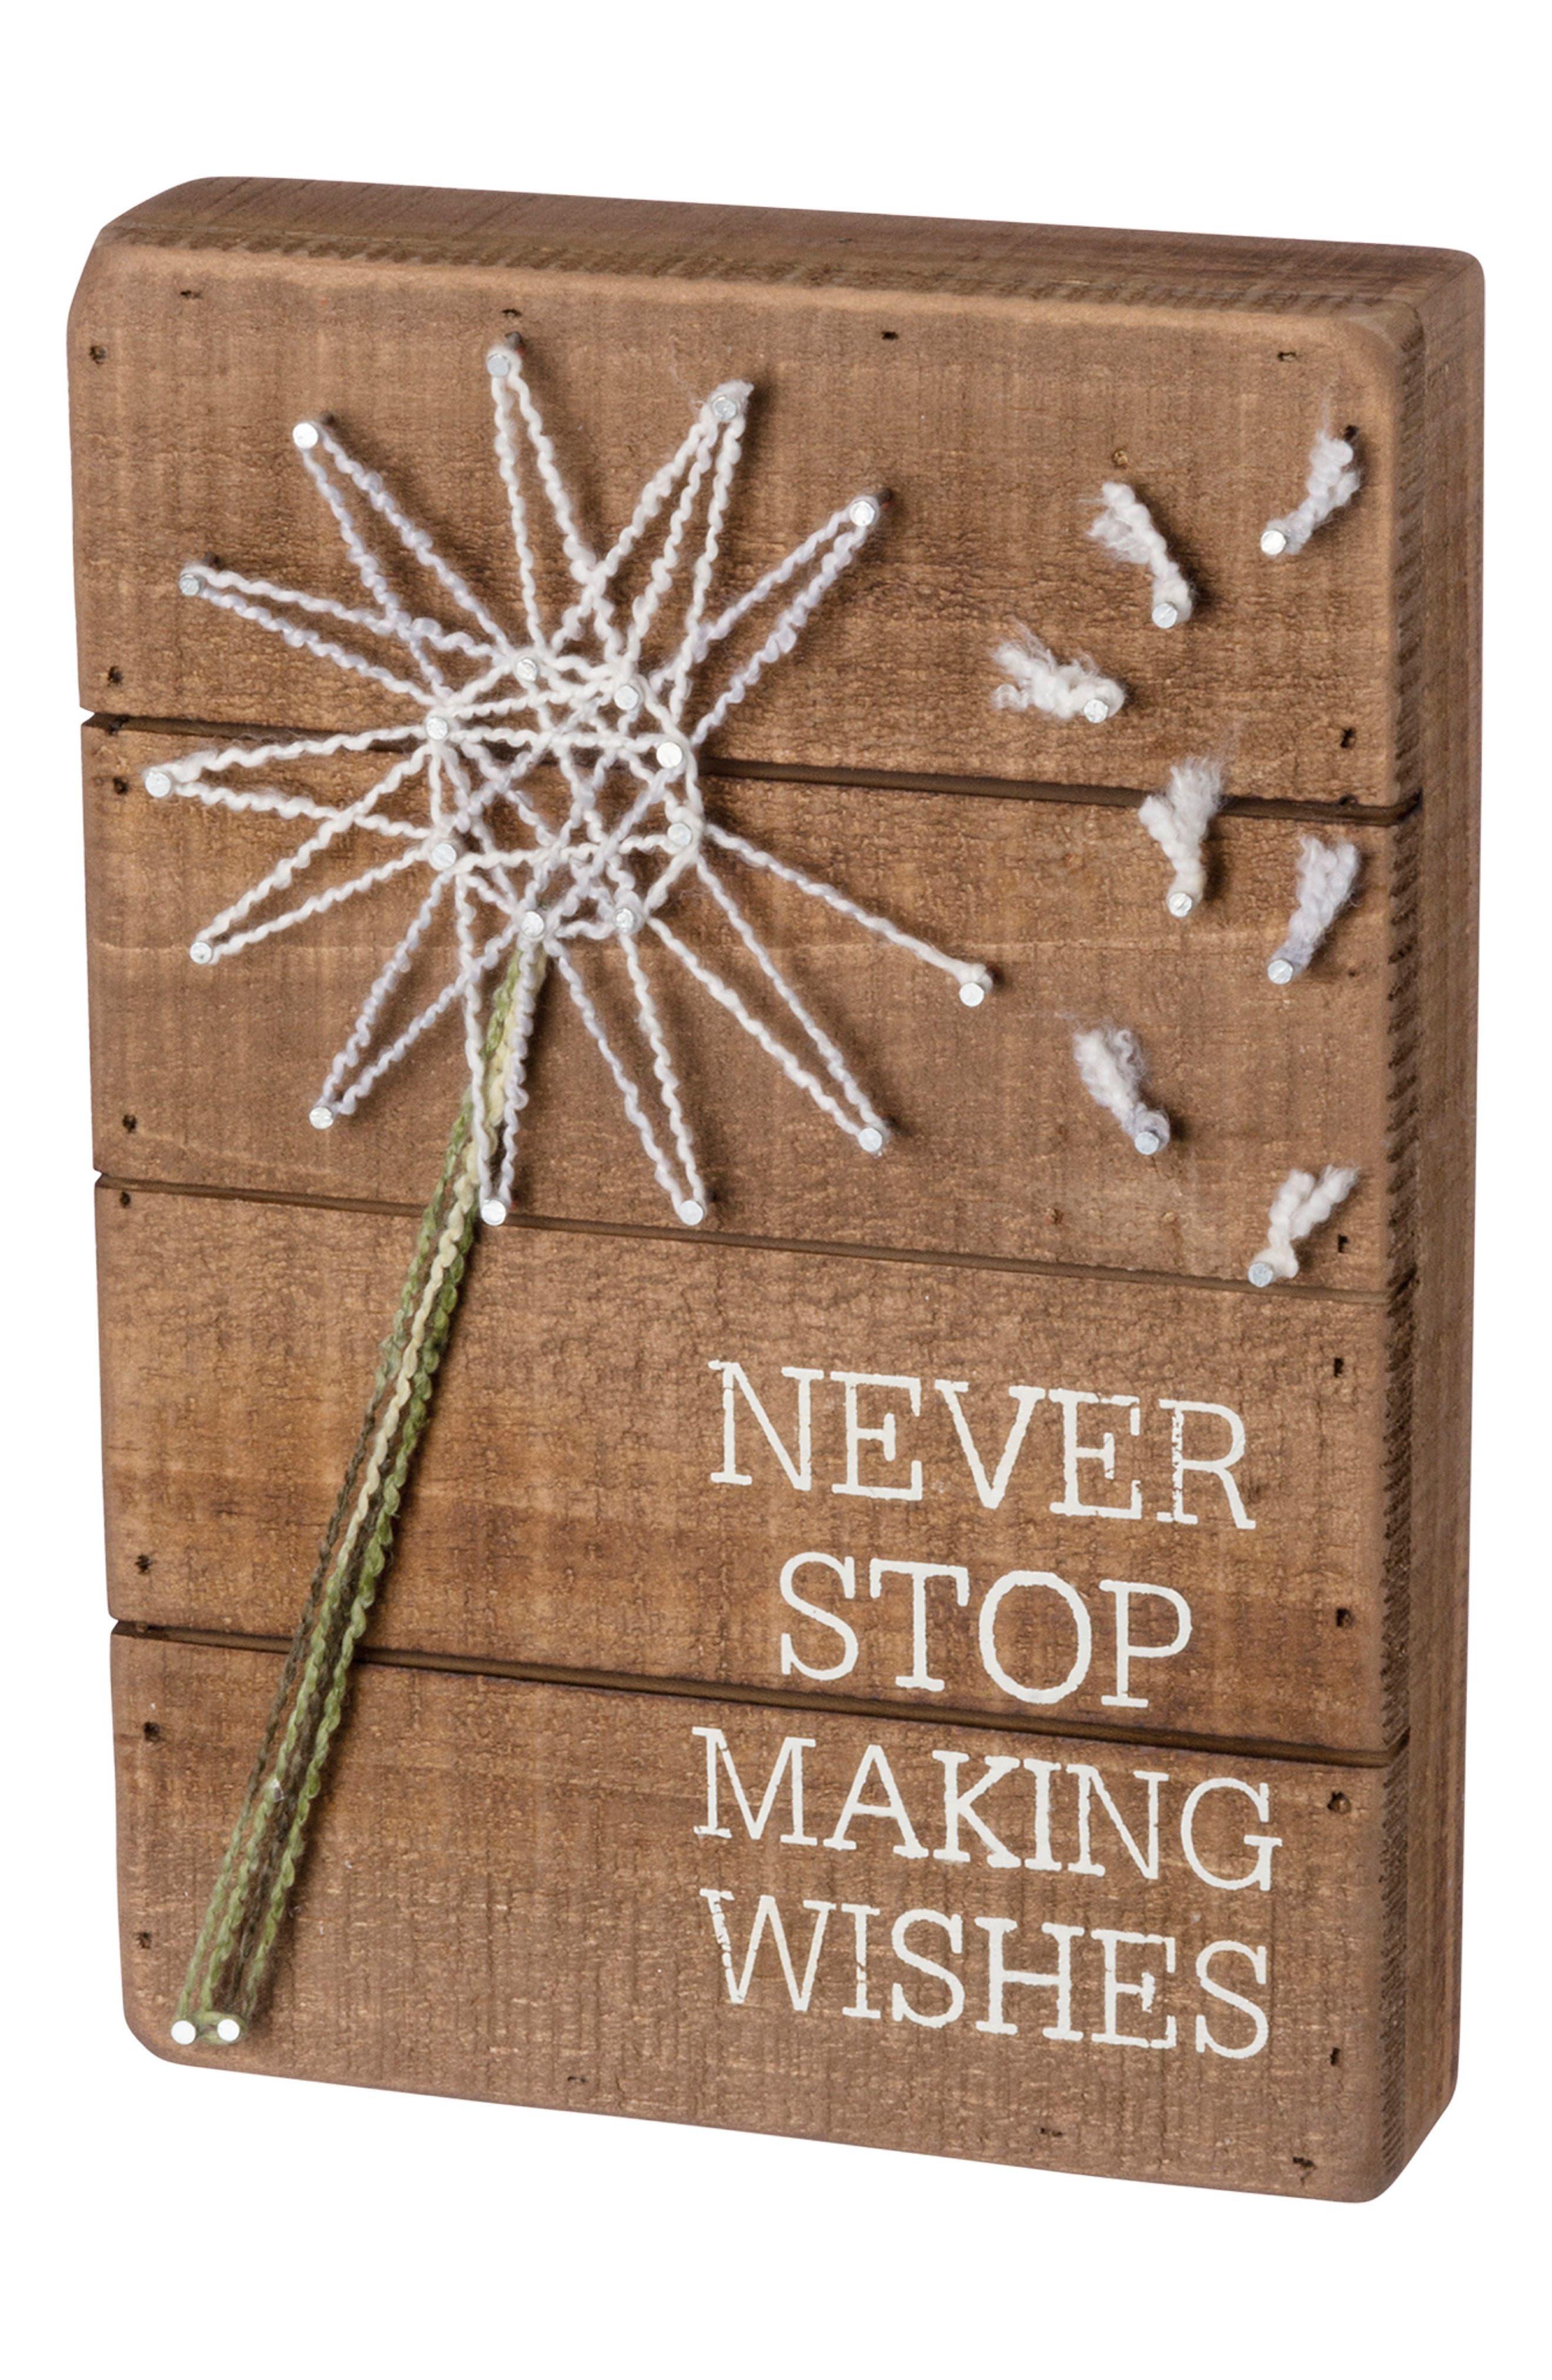 Wishes String Art Box Sign,                             Main thumbnail 1, color,                             200